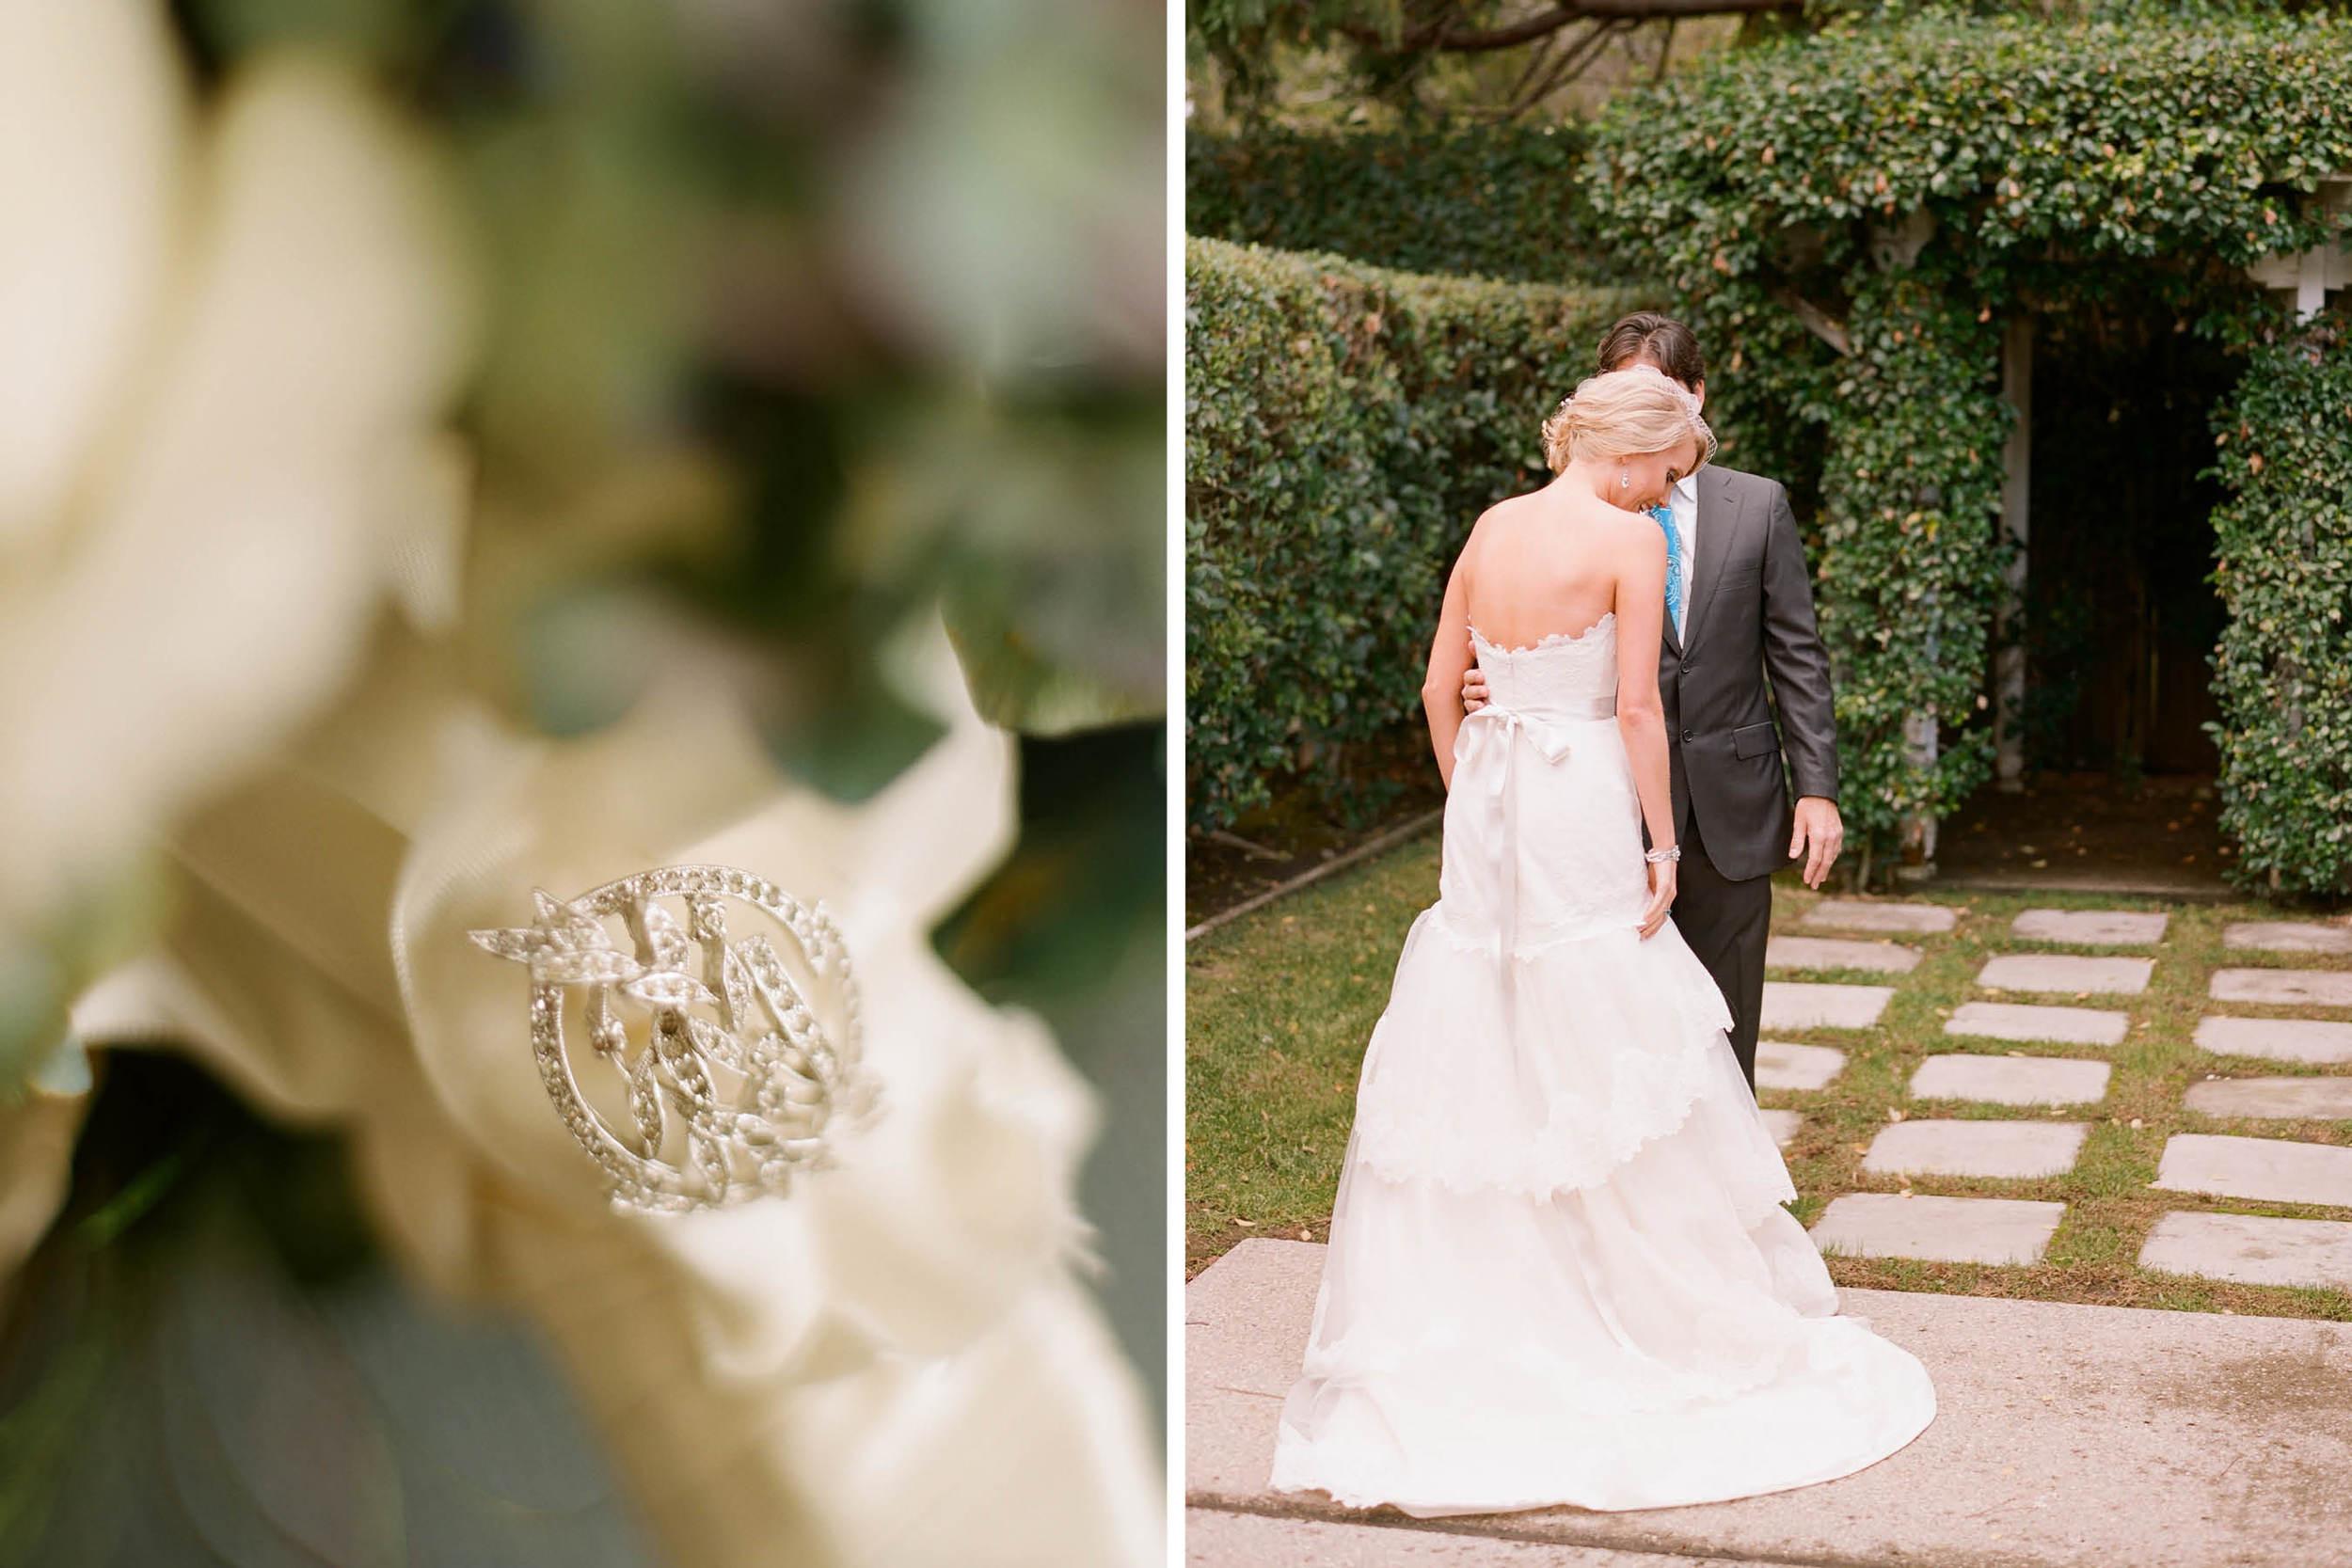 tres-hermanas-winery-vineyard-wedding-planner-coordinator-santa-barbara-ynez-maria (2).jpg